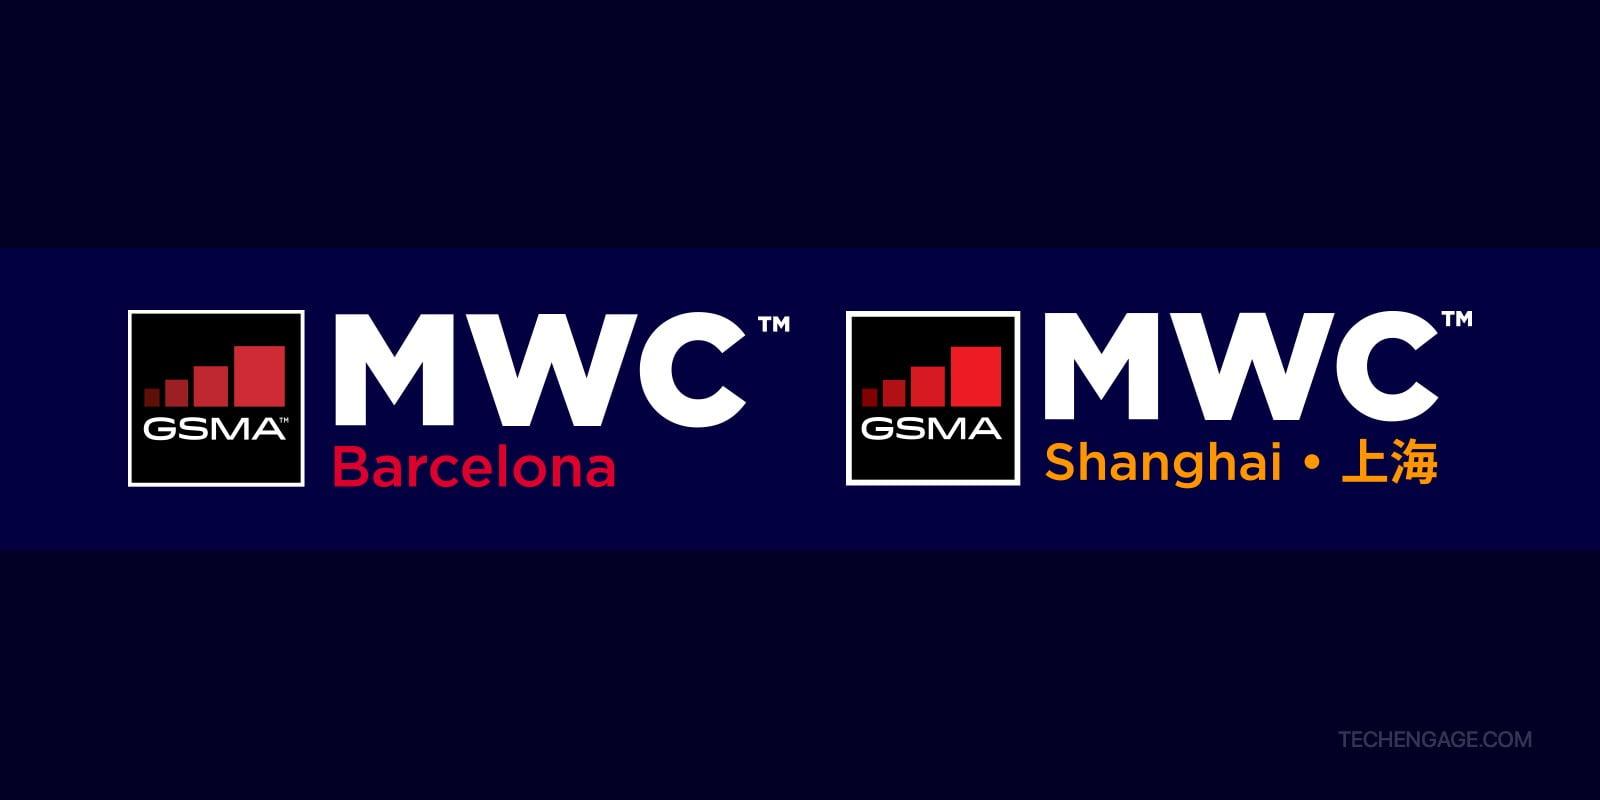 GSMA to hold MWC 2021 amid COVID-19 crisis